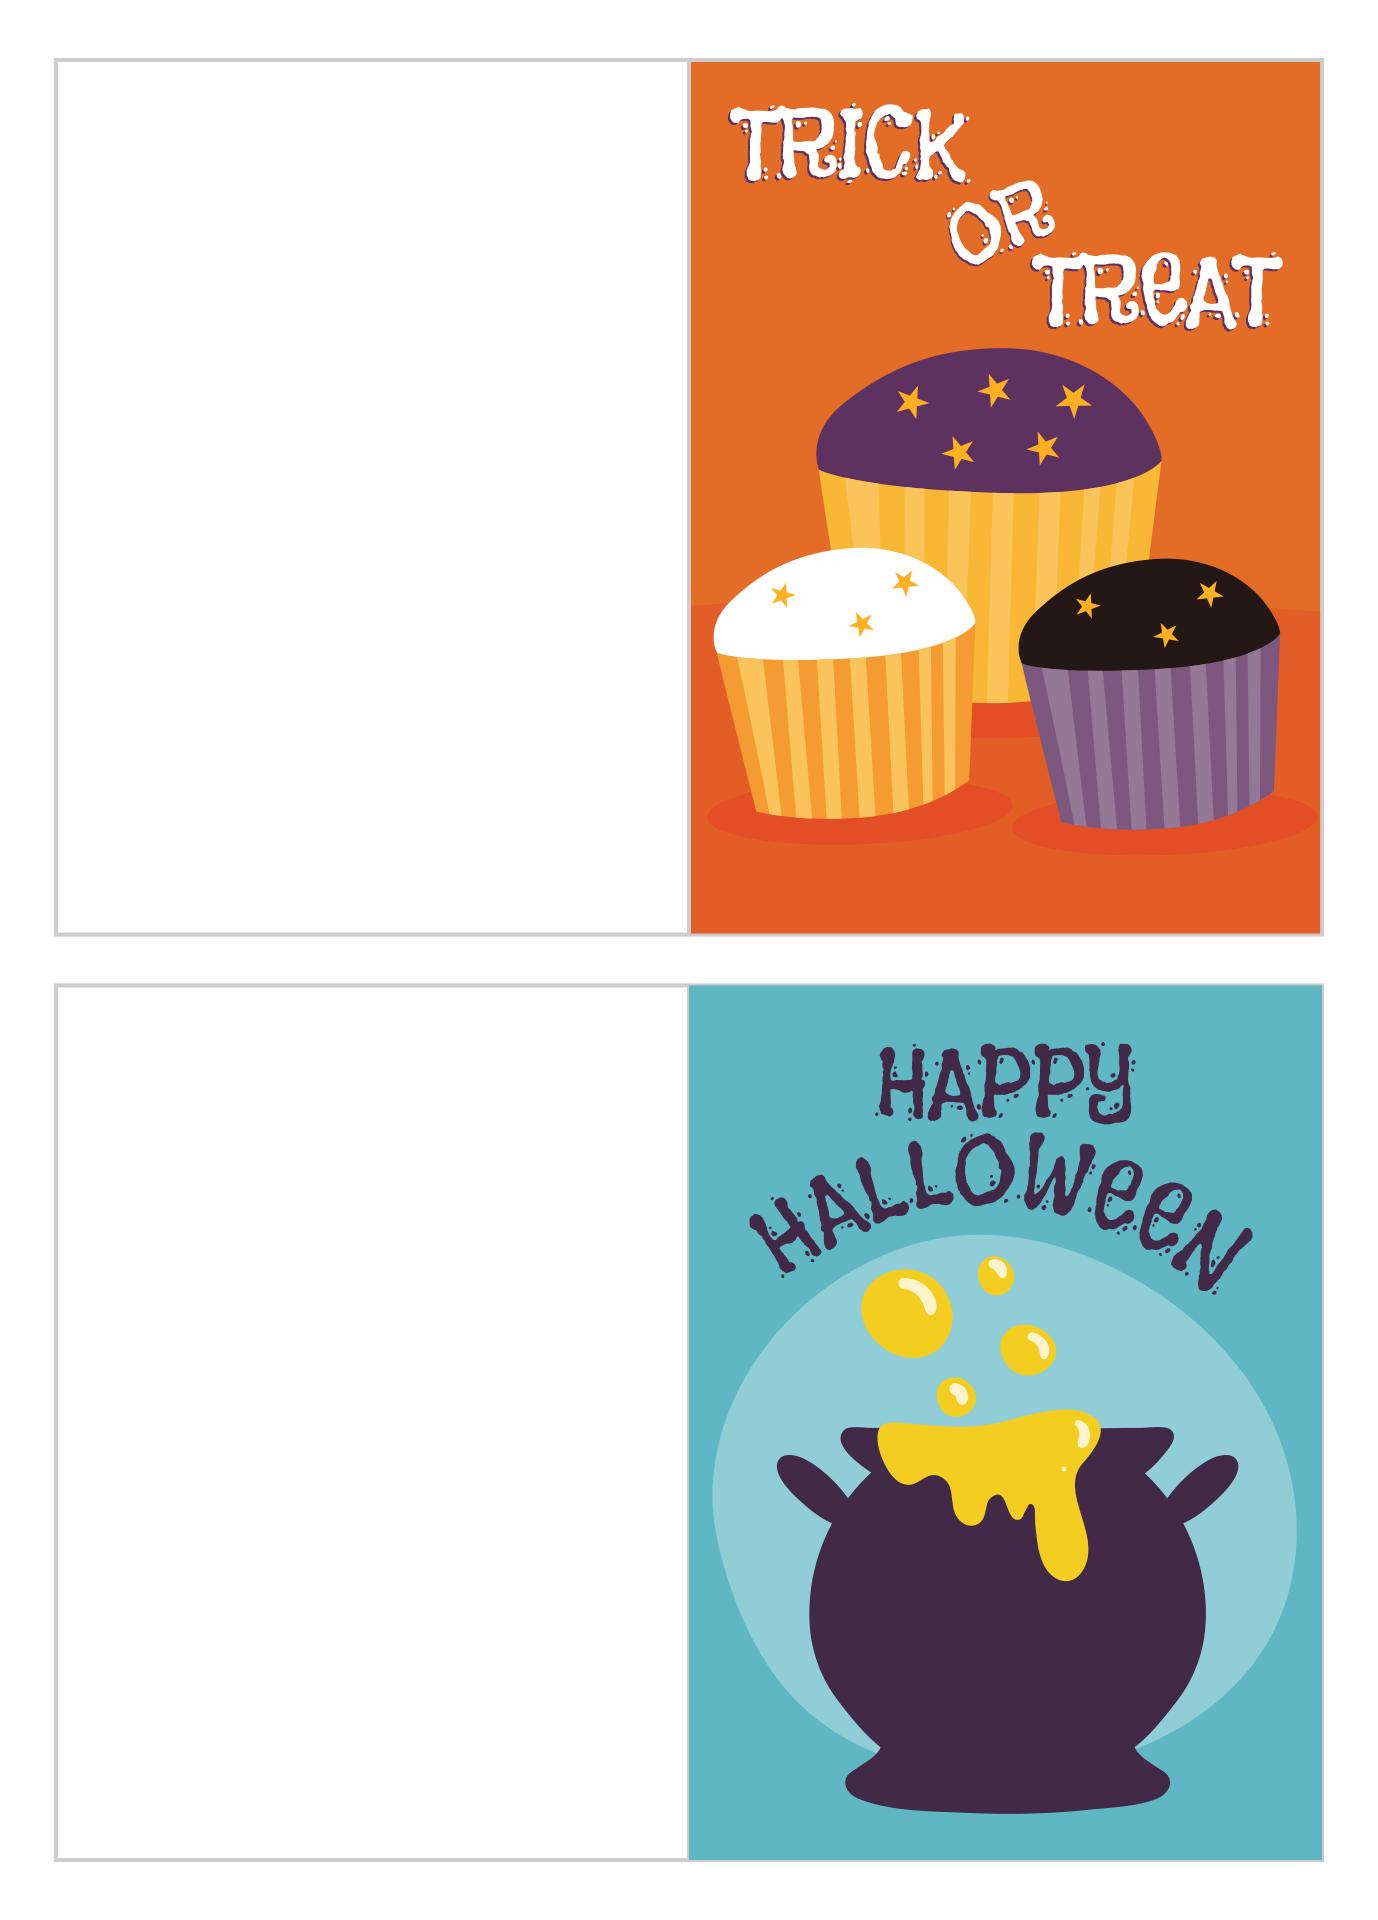 Happy Halloween Greeting Cards Printable